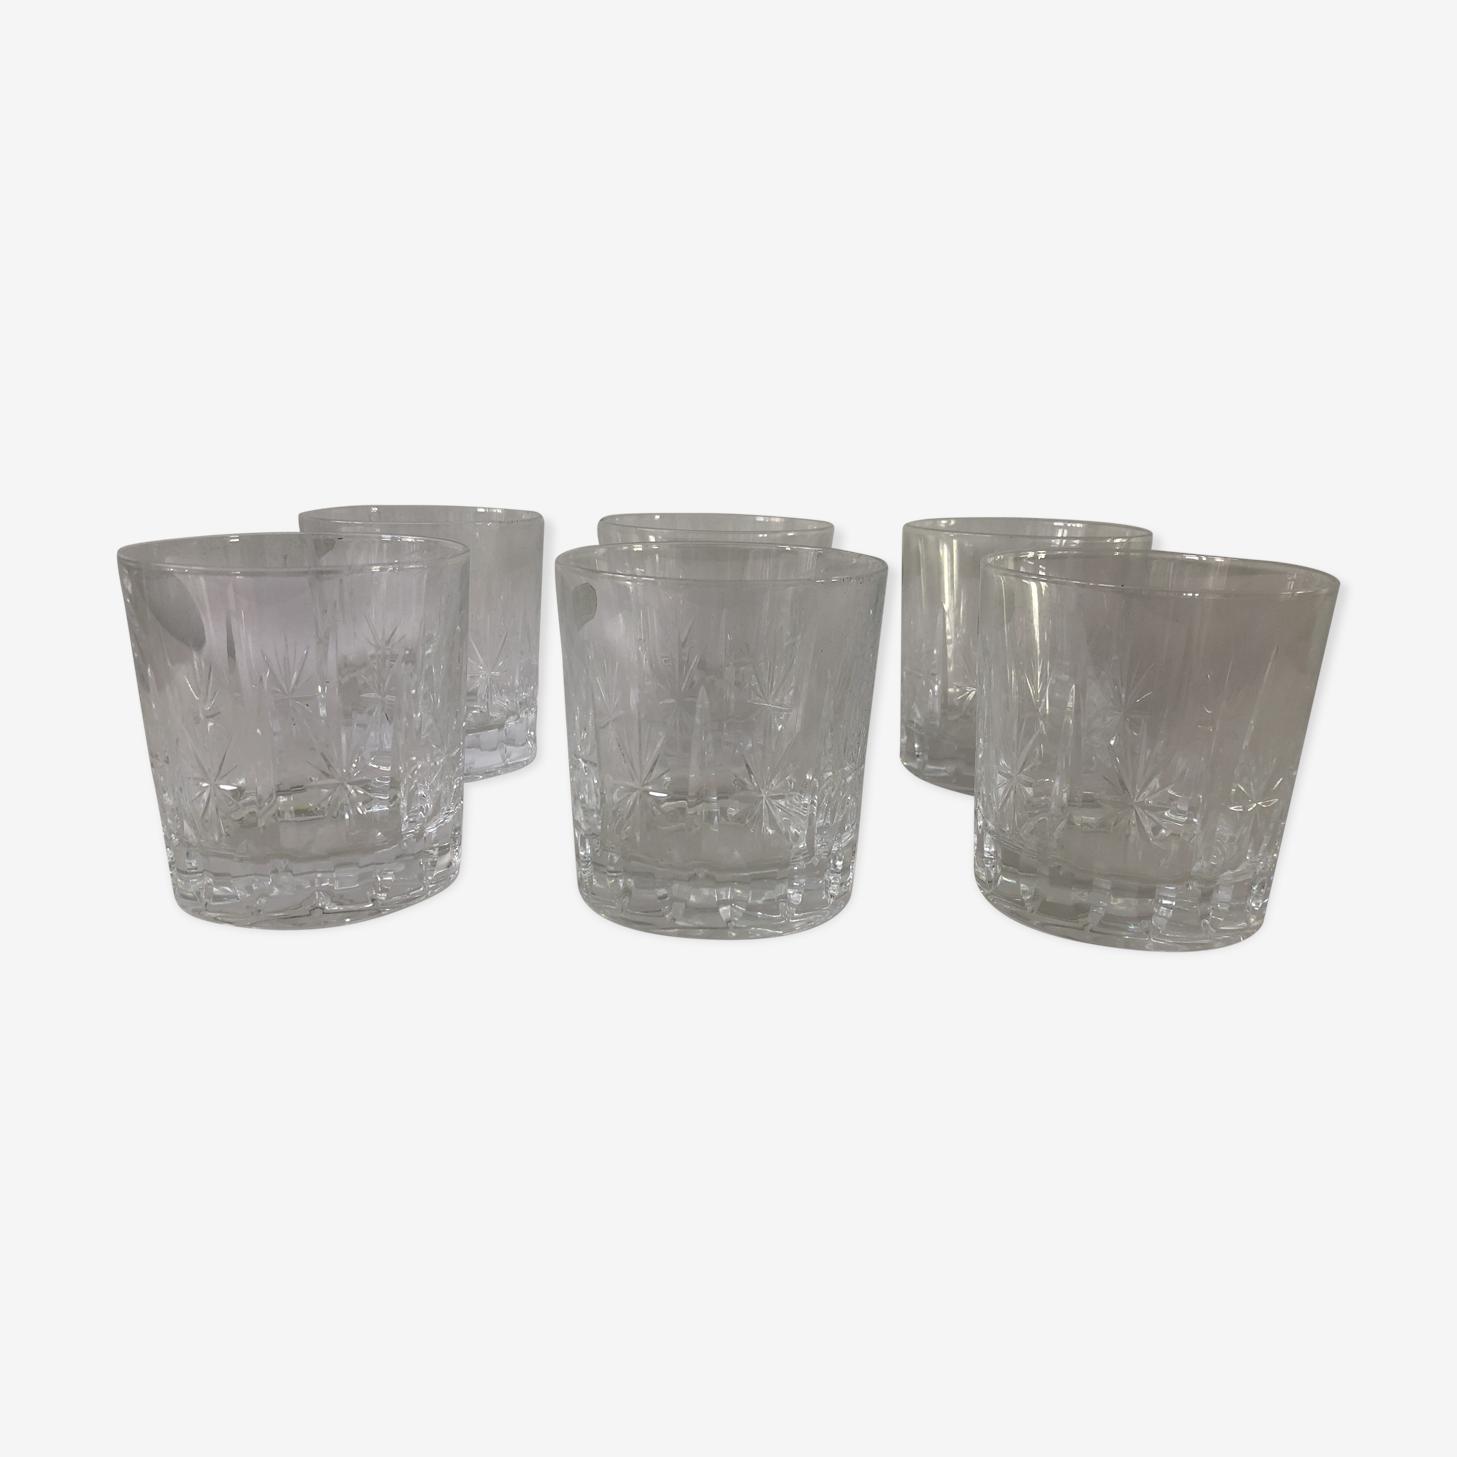 6 crystal whisky glasses